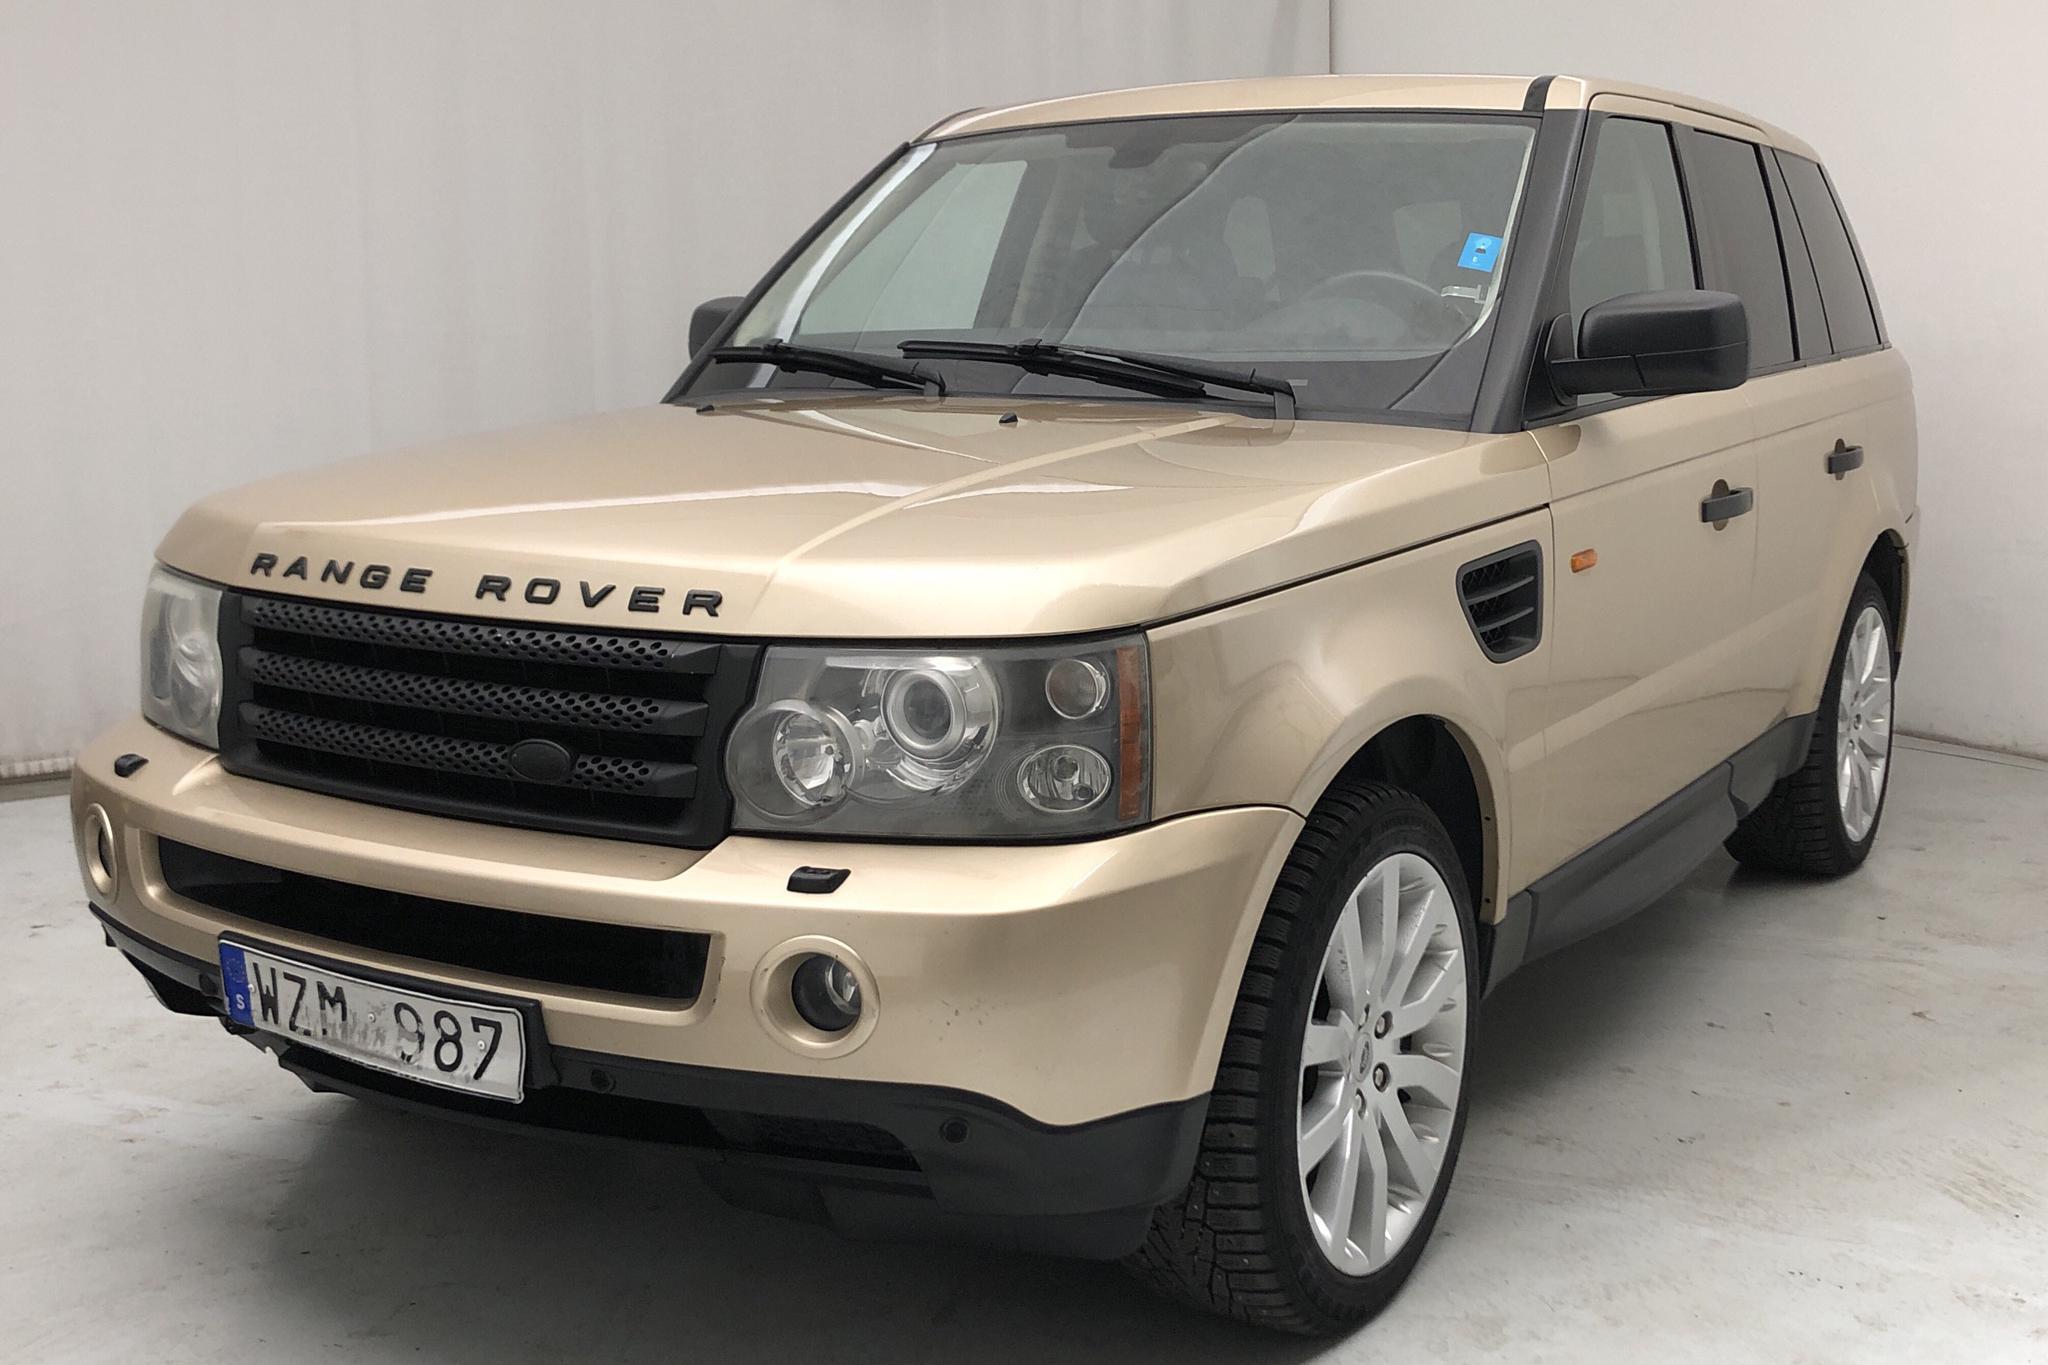 Land Rover Range Rover Sport V8 S/C (390hk) - 22 604 mil - Automat - gul - 2006